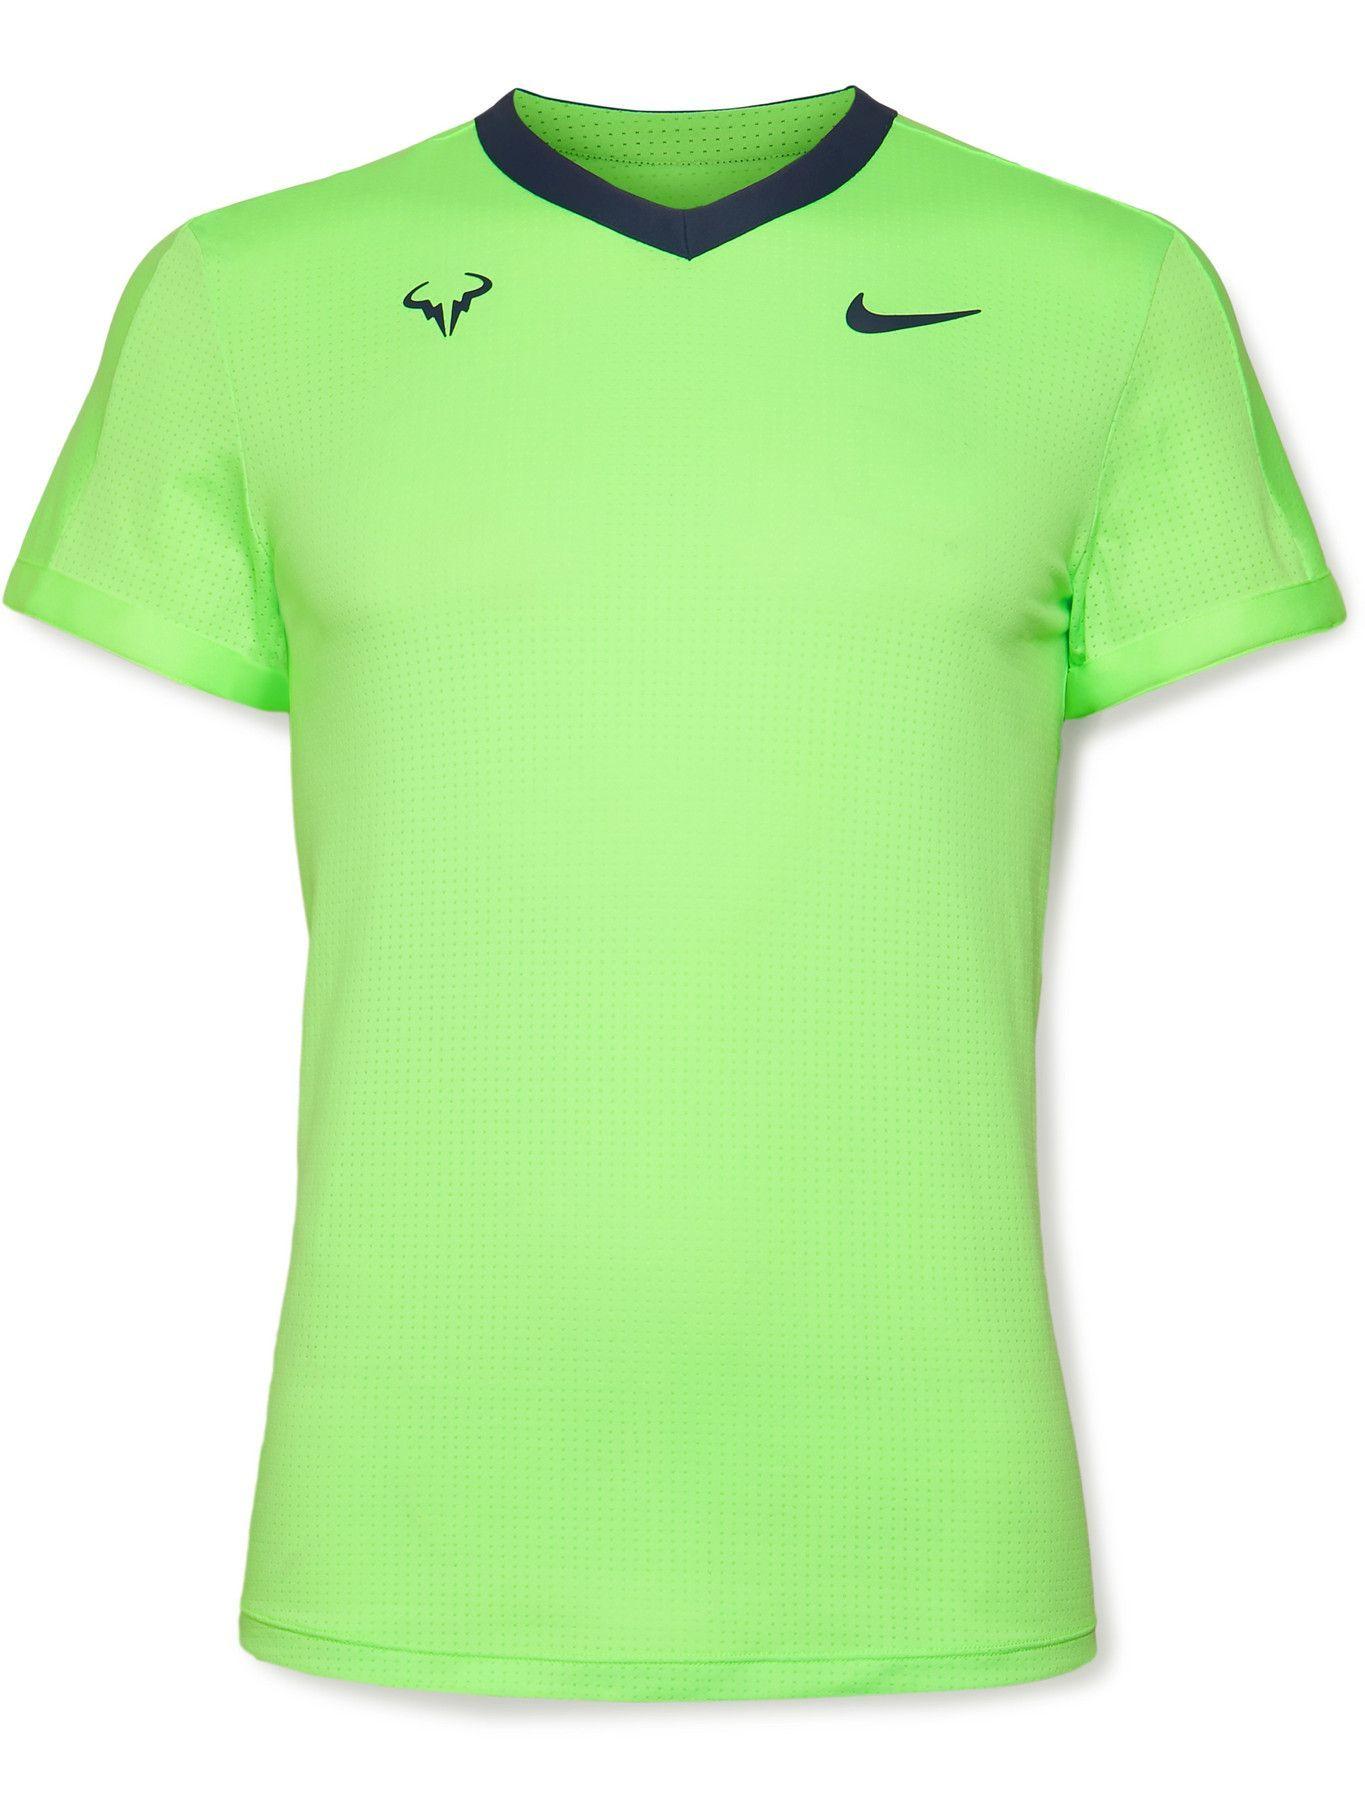 Photo: Nike Tennis - NikeCourt Dri-FIT ADV Rafa Tennis T-Shirt - Green